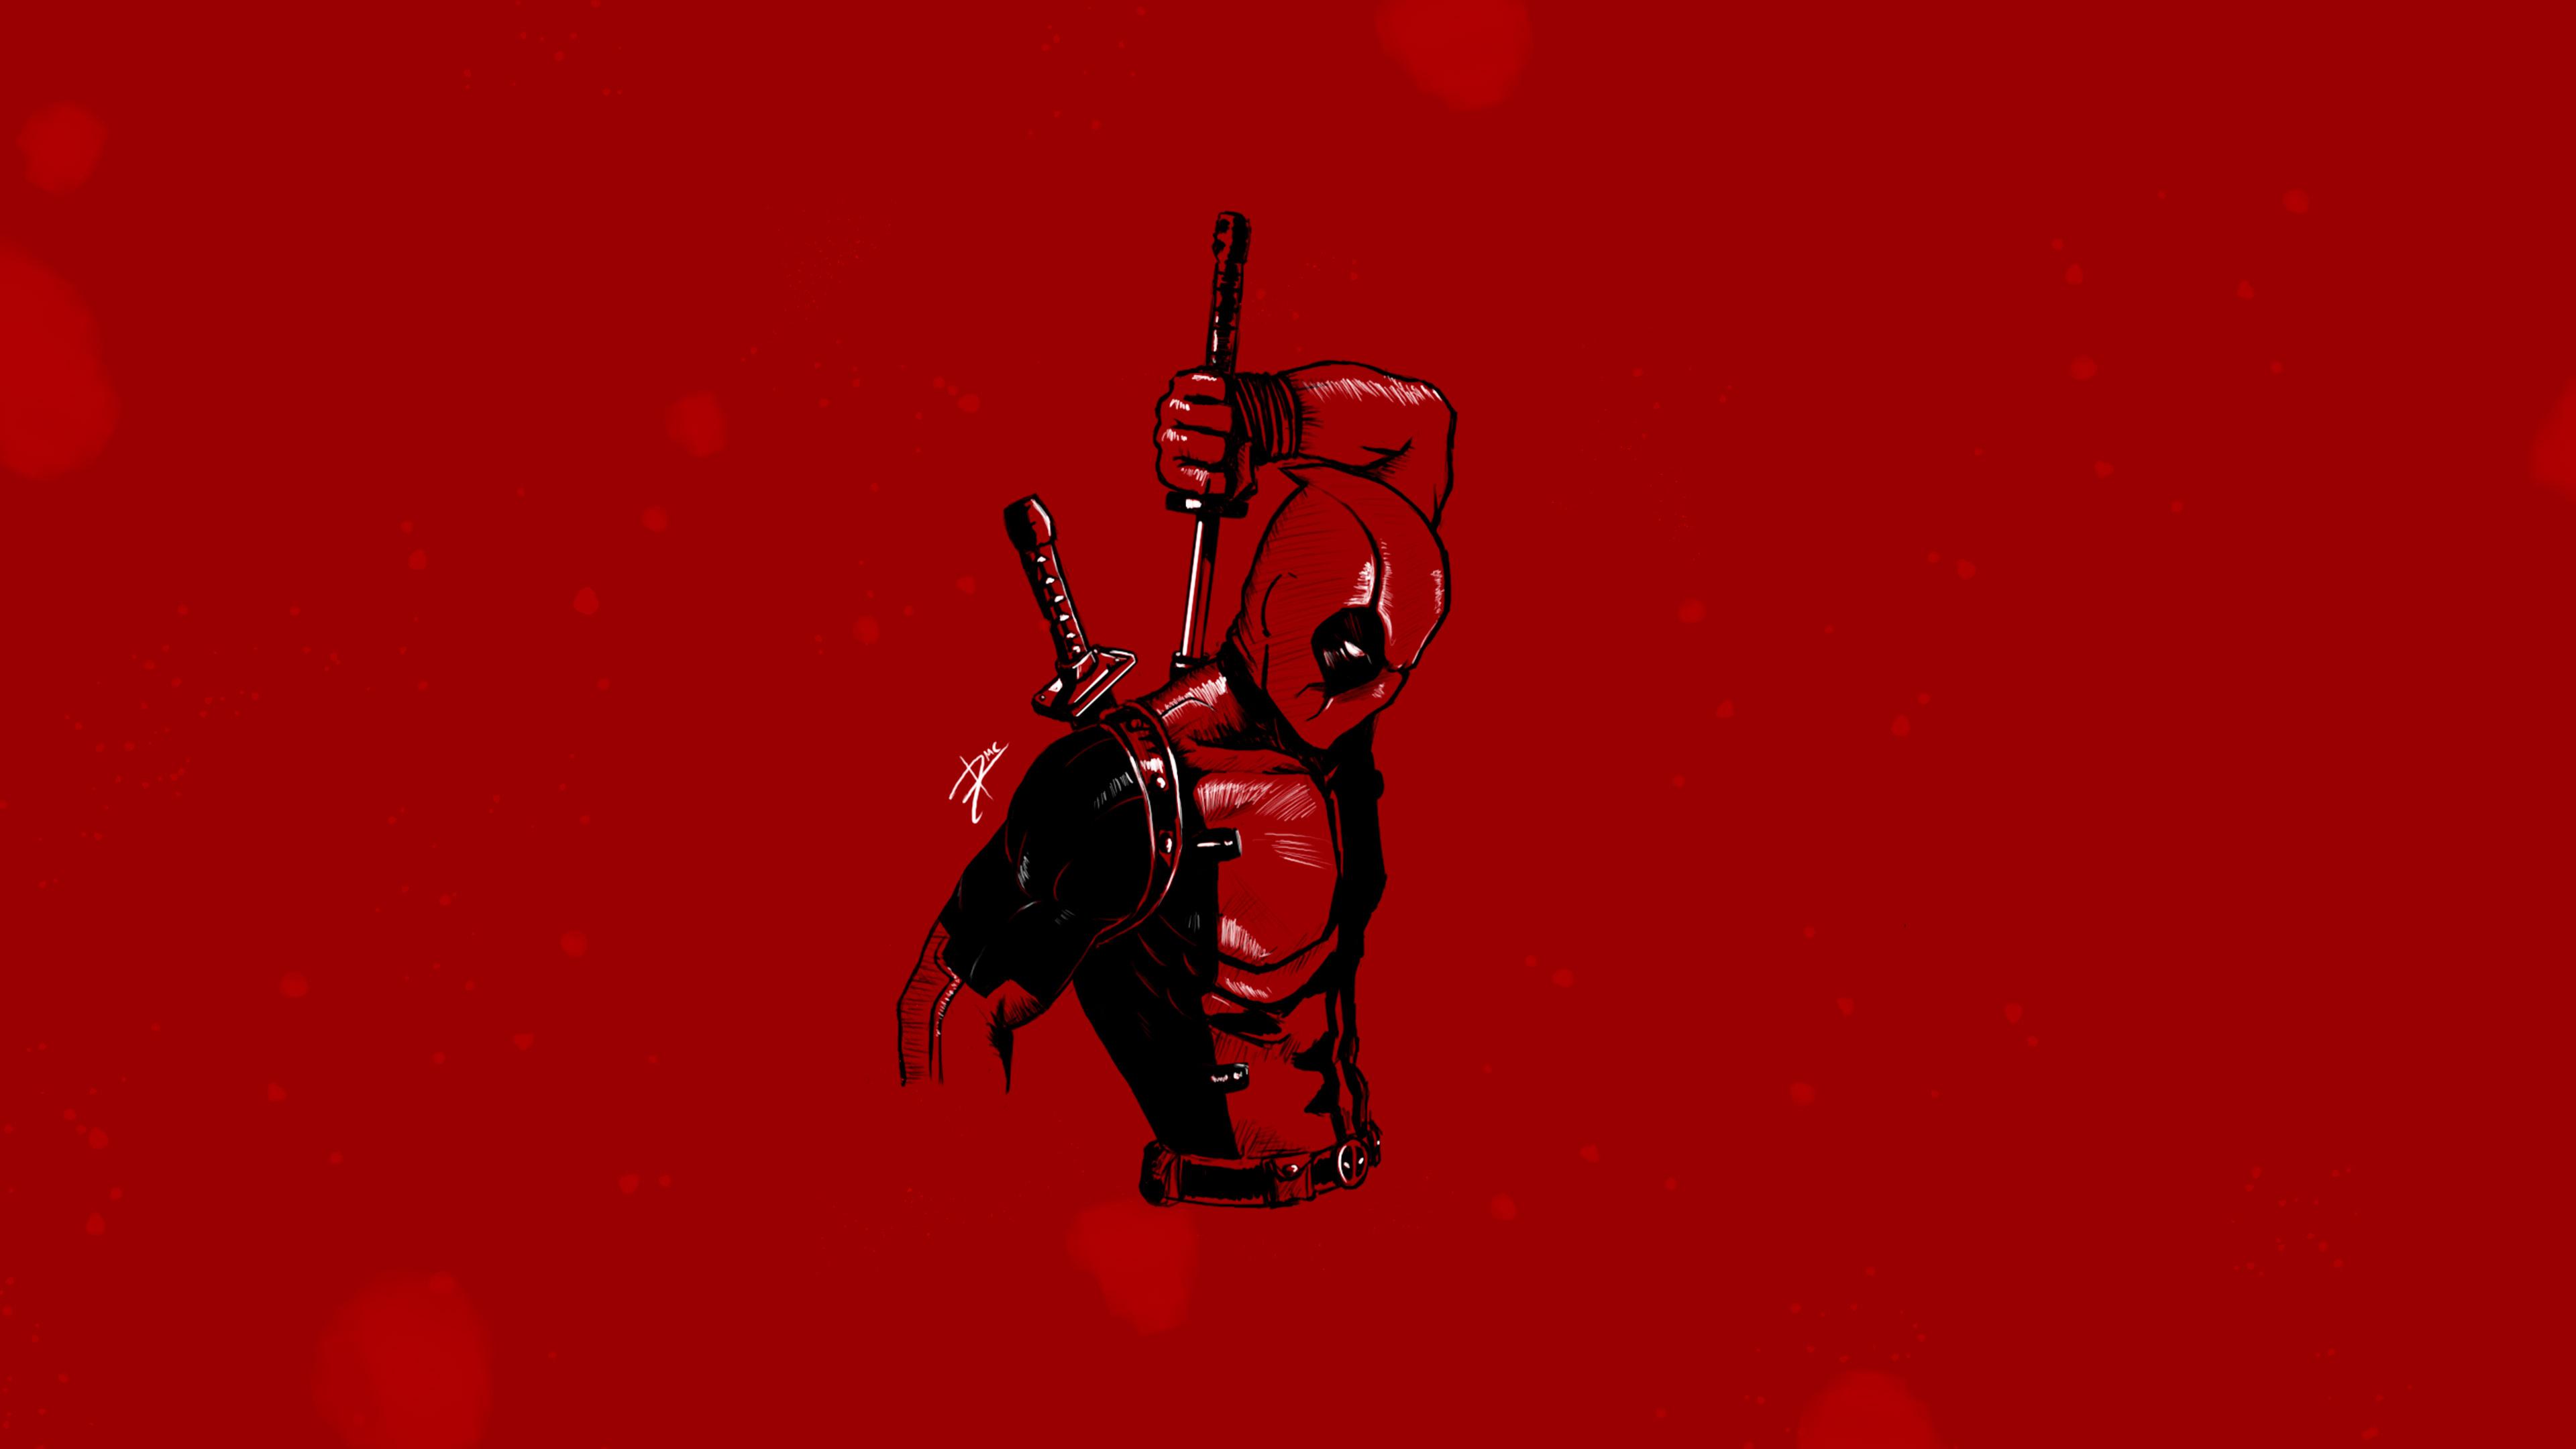 Deadpool Minimalist 4k, HD Superheroes, 4k Wallpapers ...